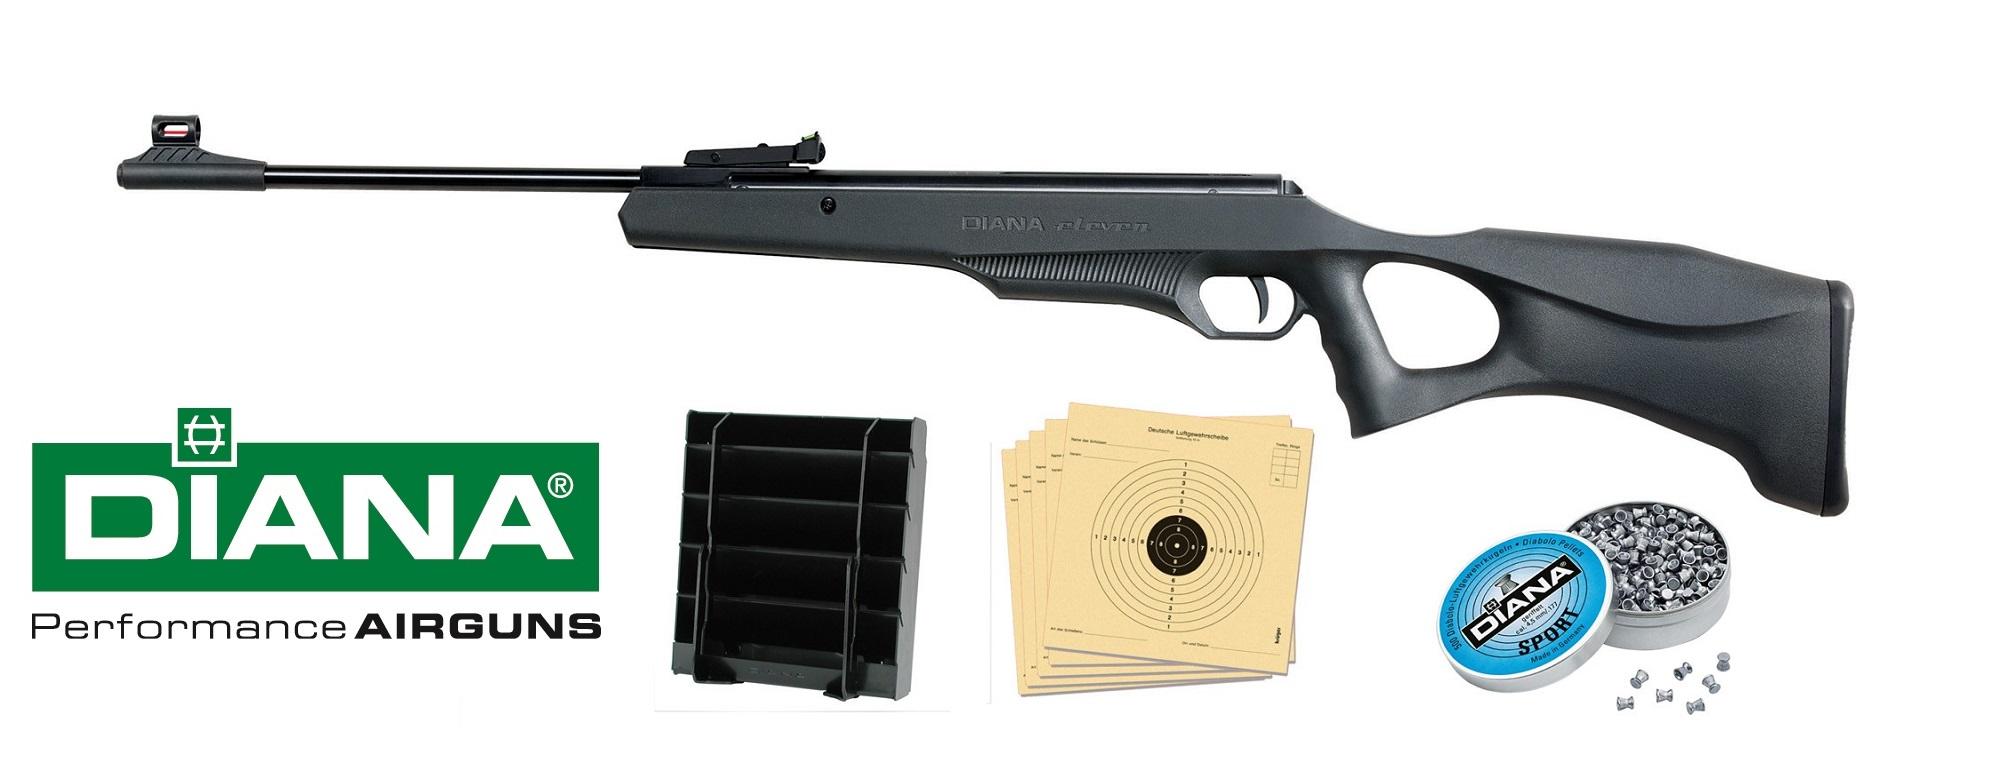 German Sport Guns GmbH In DIANA Airguns Takeover